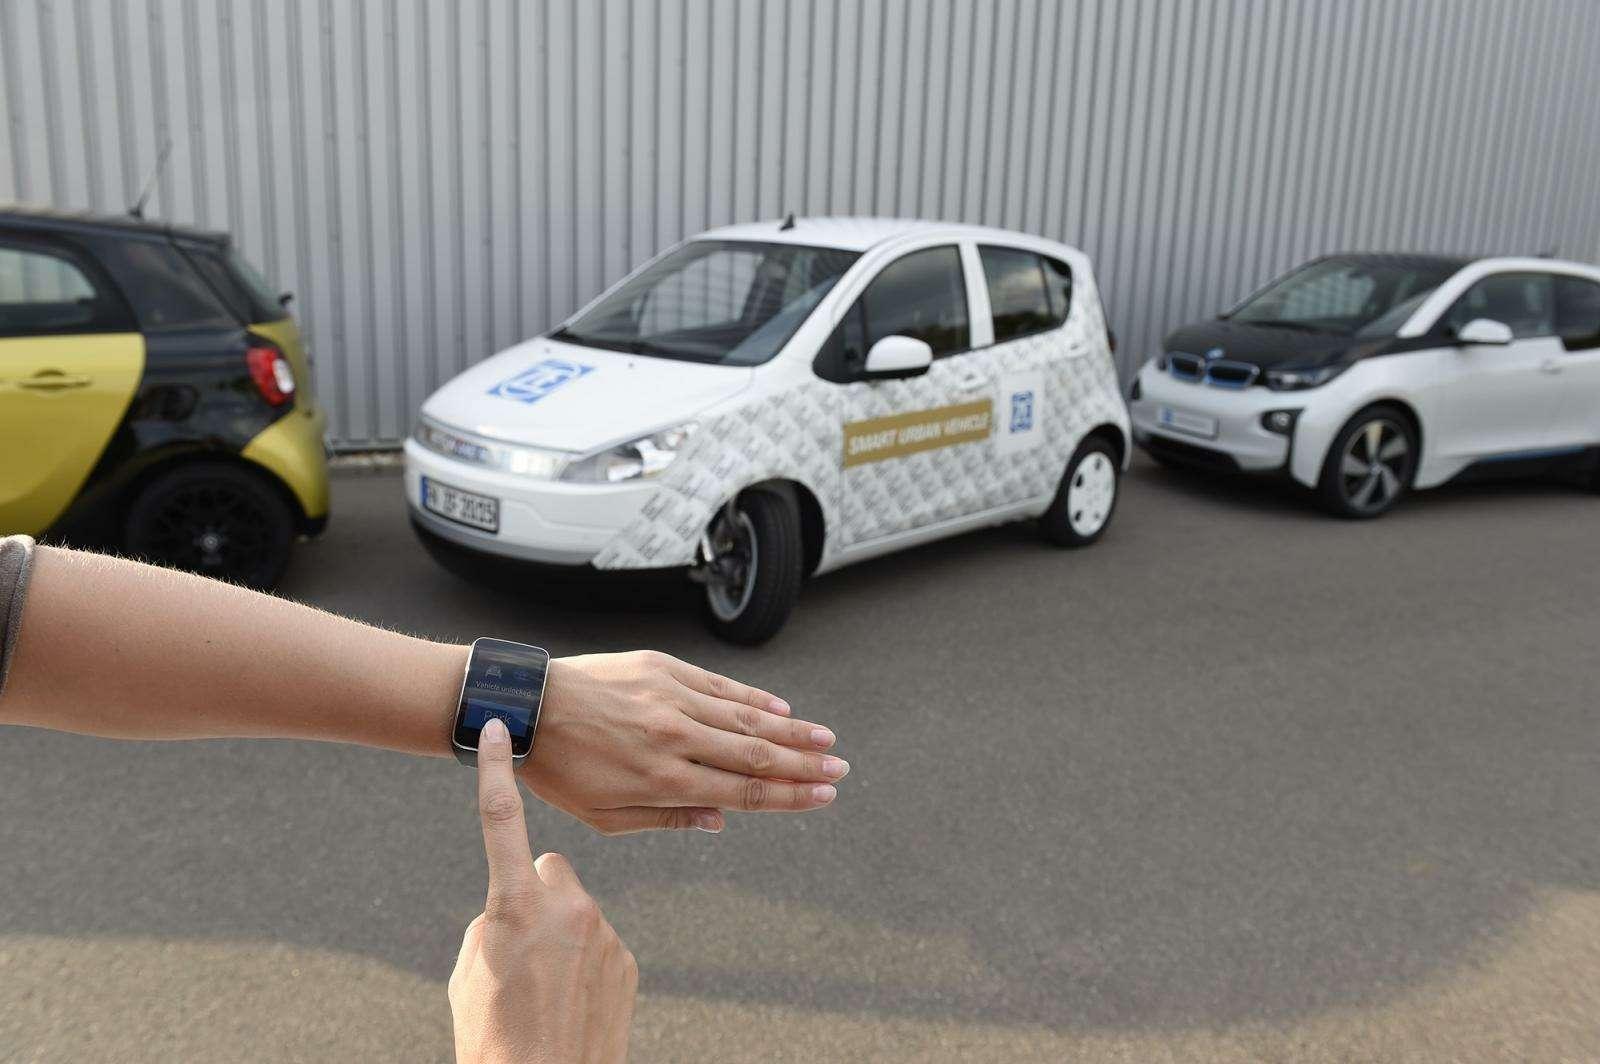 Концепт ZFSmart Urban Vehicle